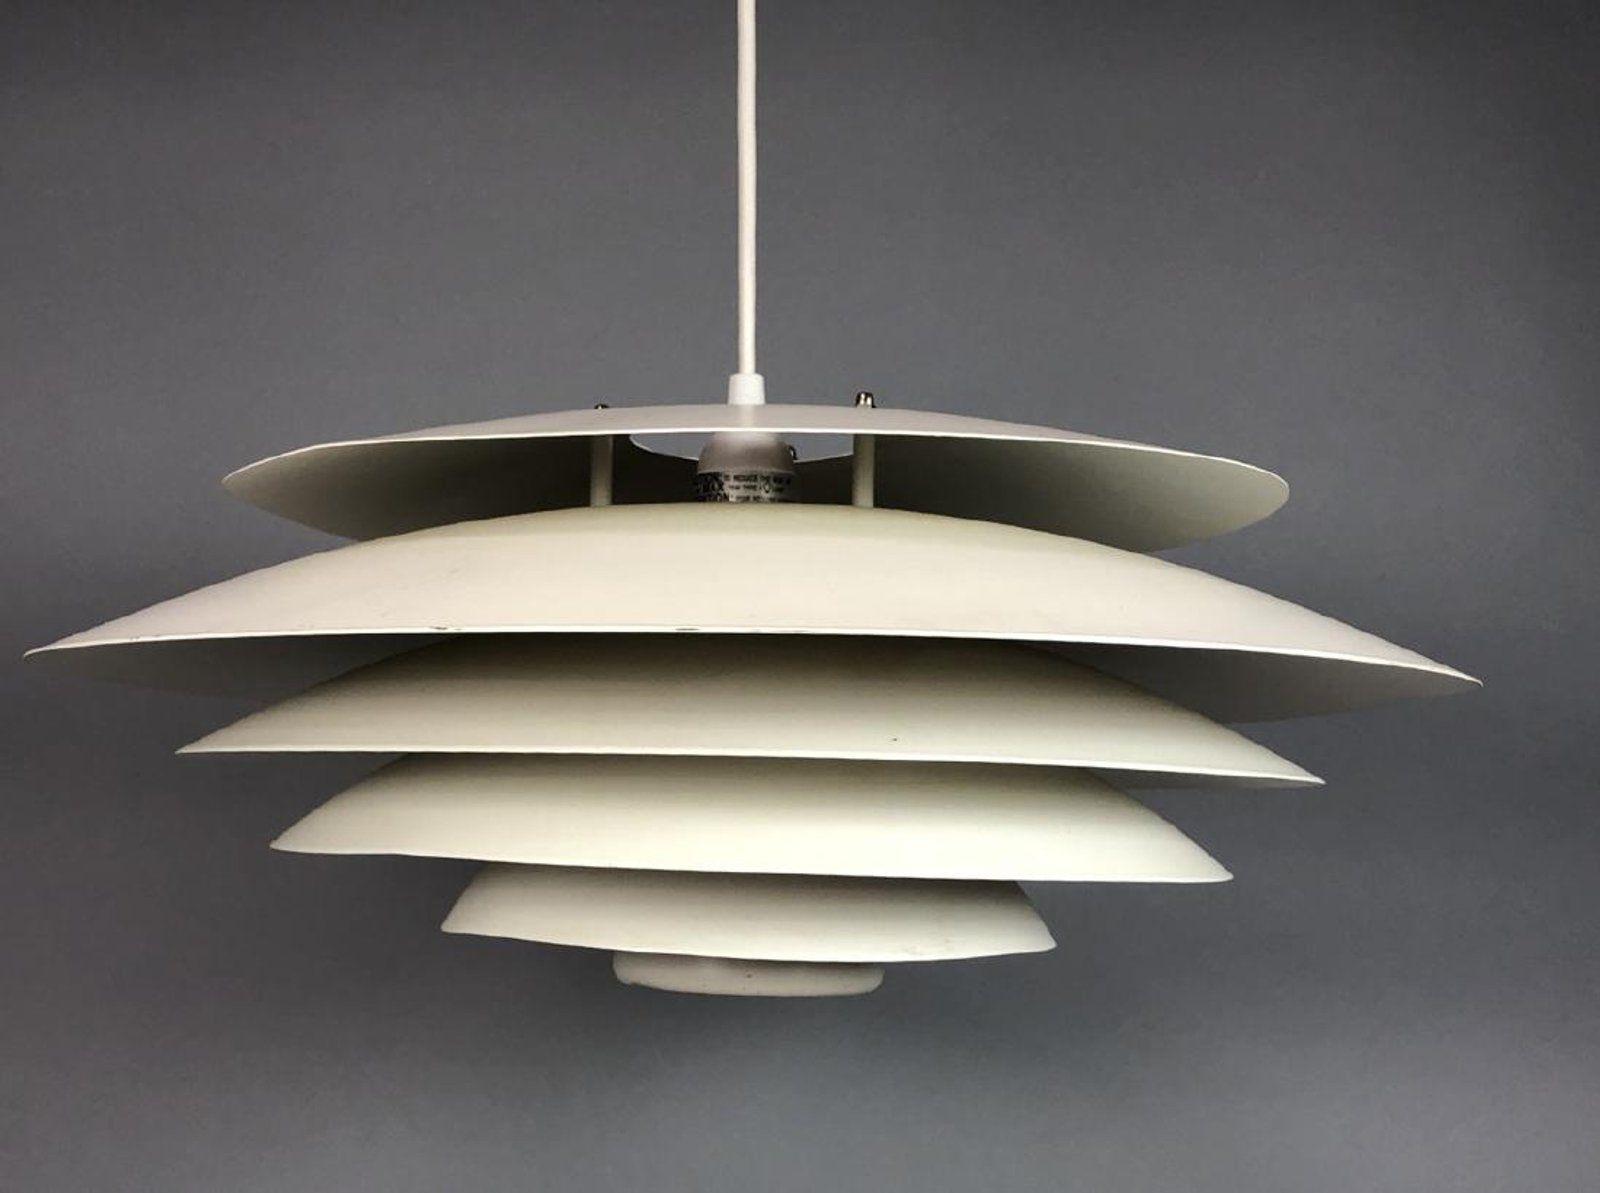 Sold For 275 Mar 2018 Est 100 200 Louis Poulsen Hanging Louver Chandelier Light Fixture White Enameled Metal Not Marked